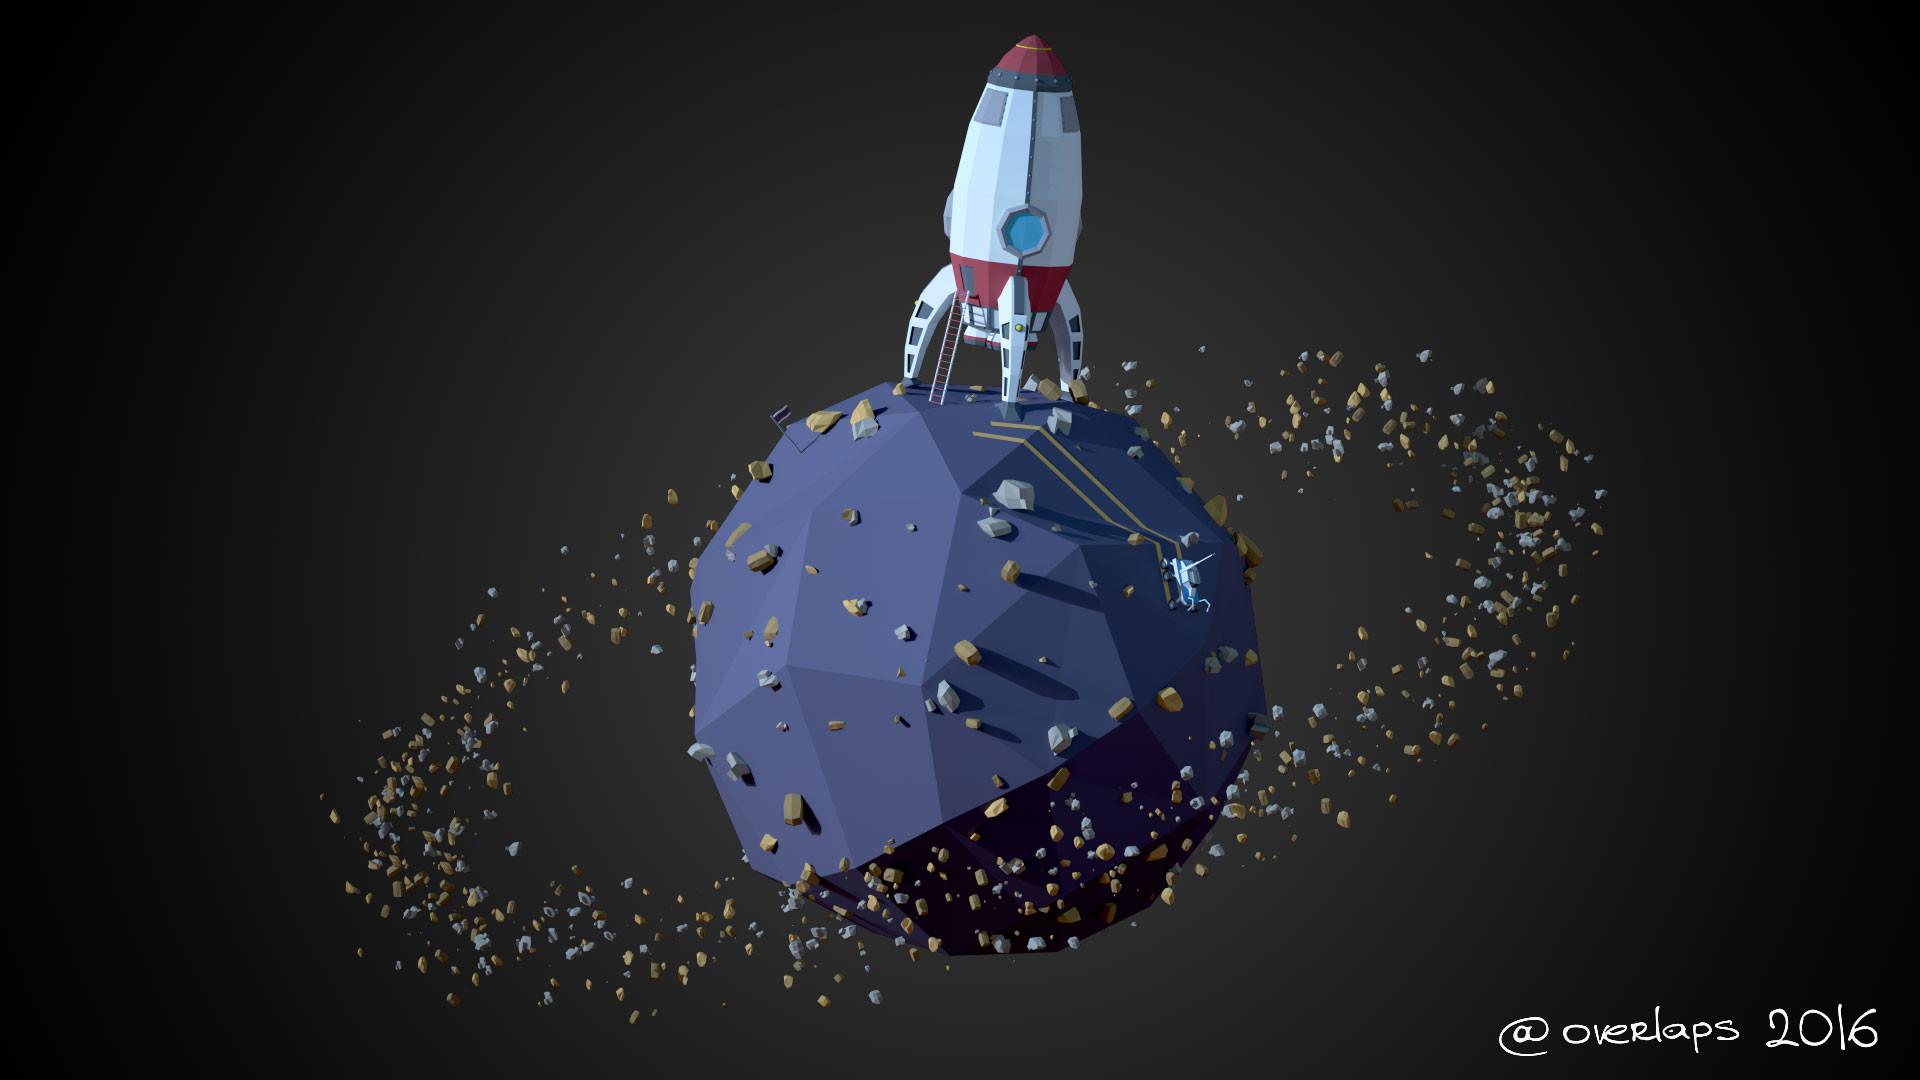 Andrey lukashov wlp8 spaceexploration